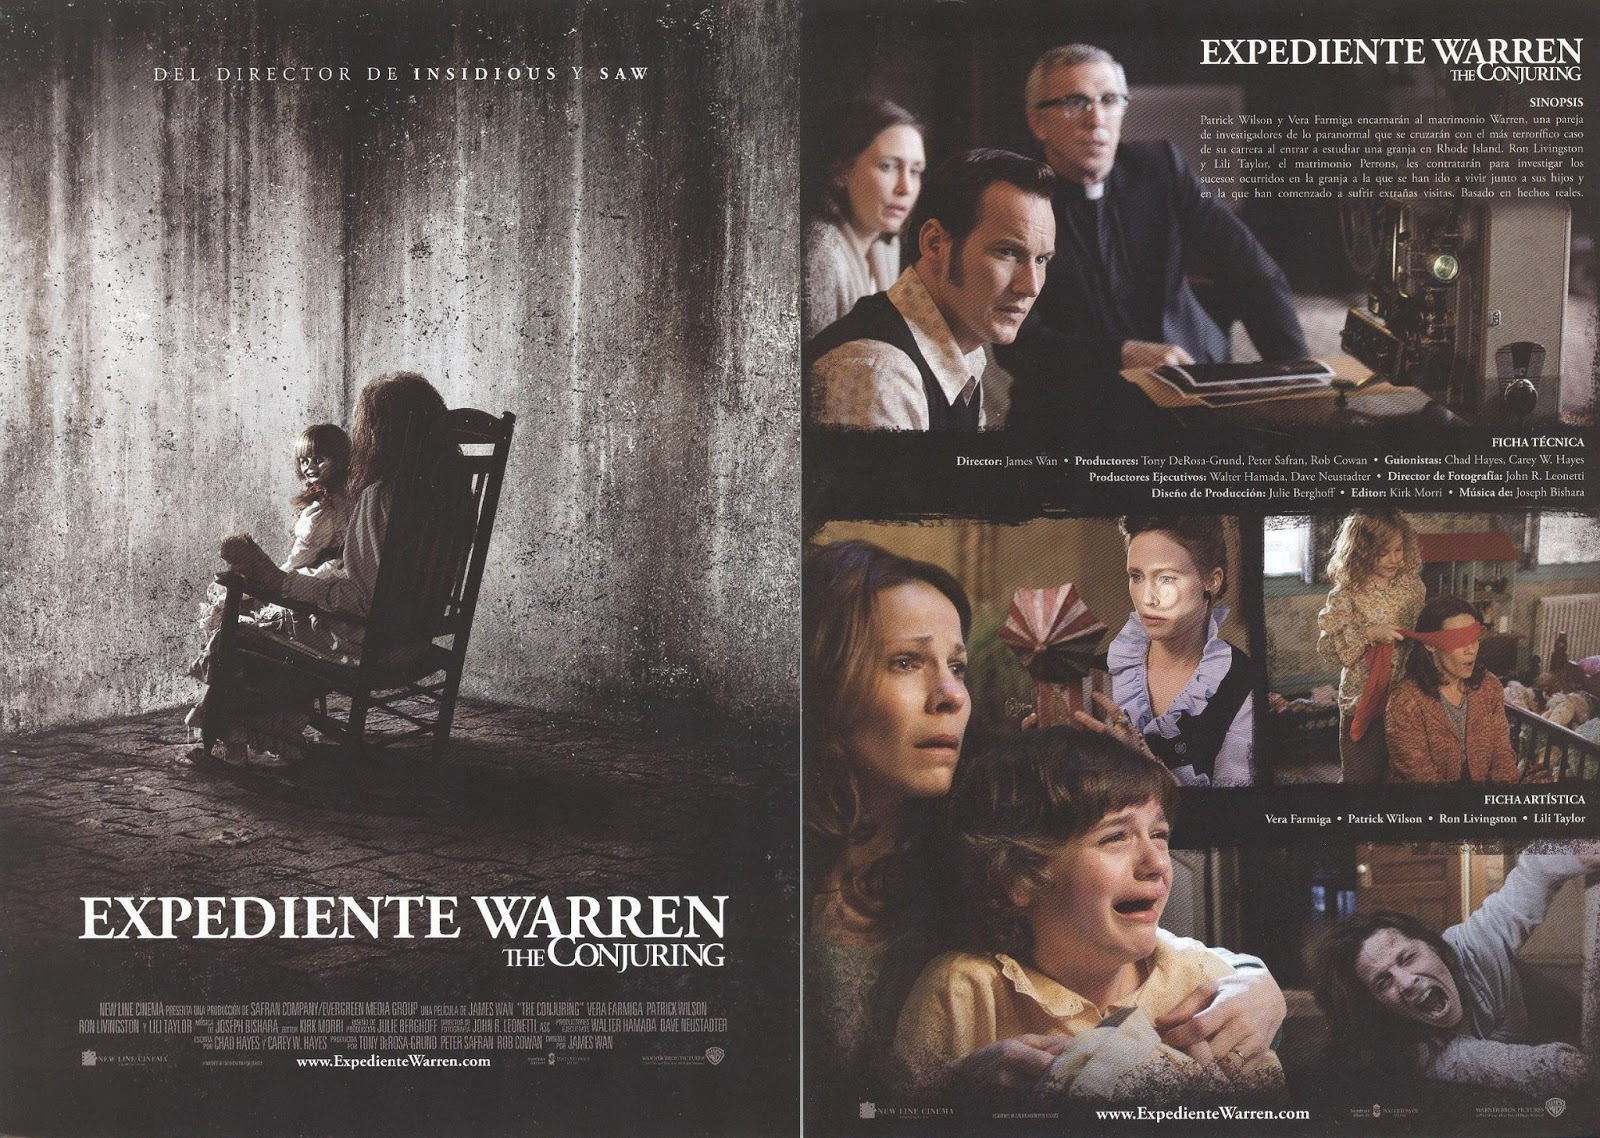 Expediente Warren. The Conjuring (2013)